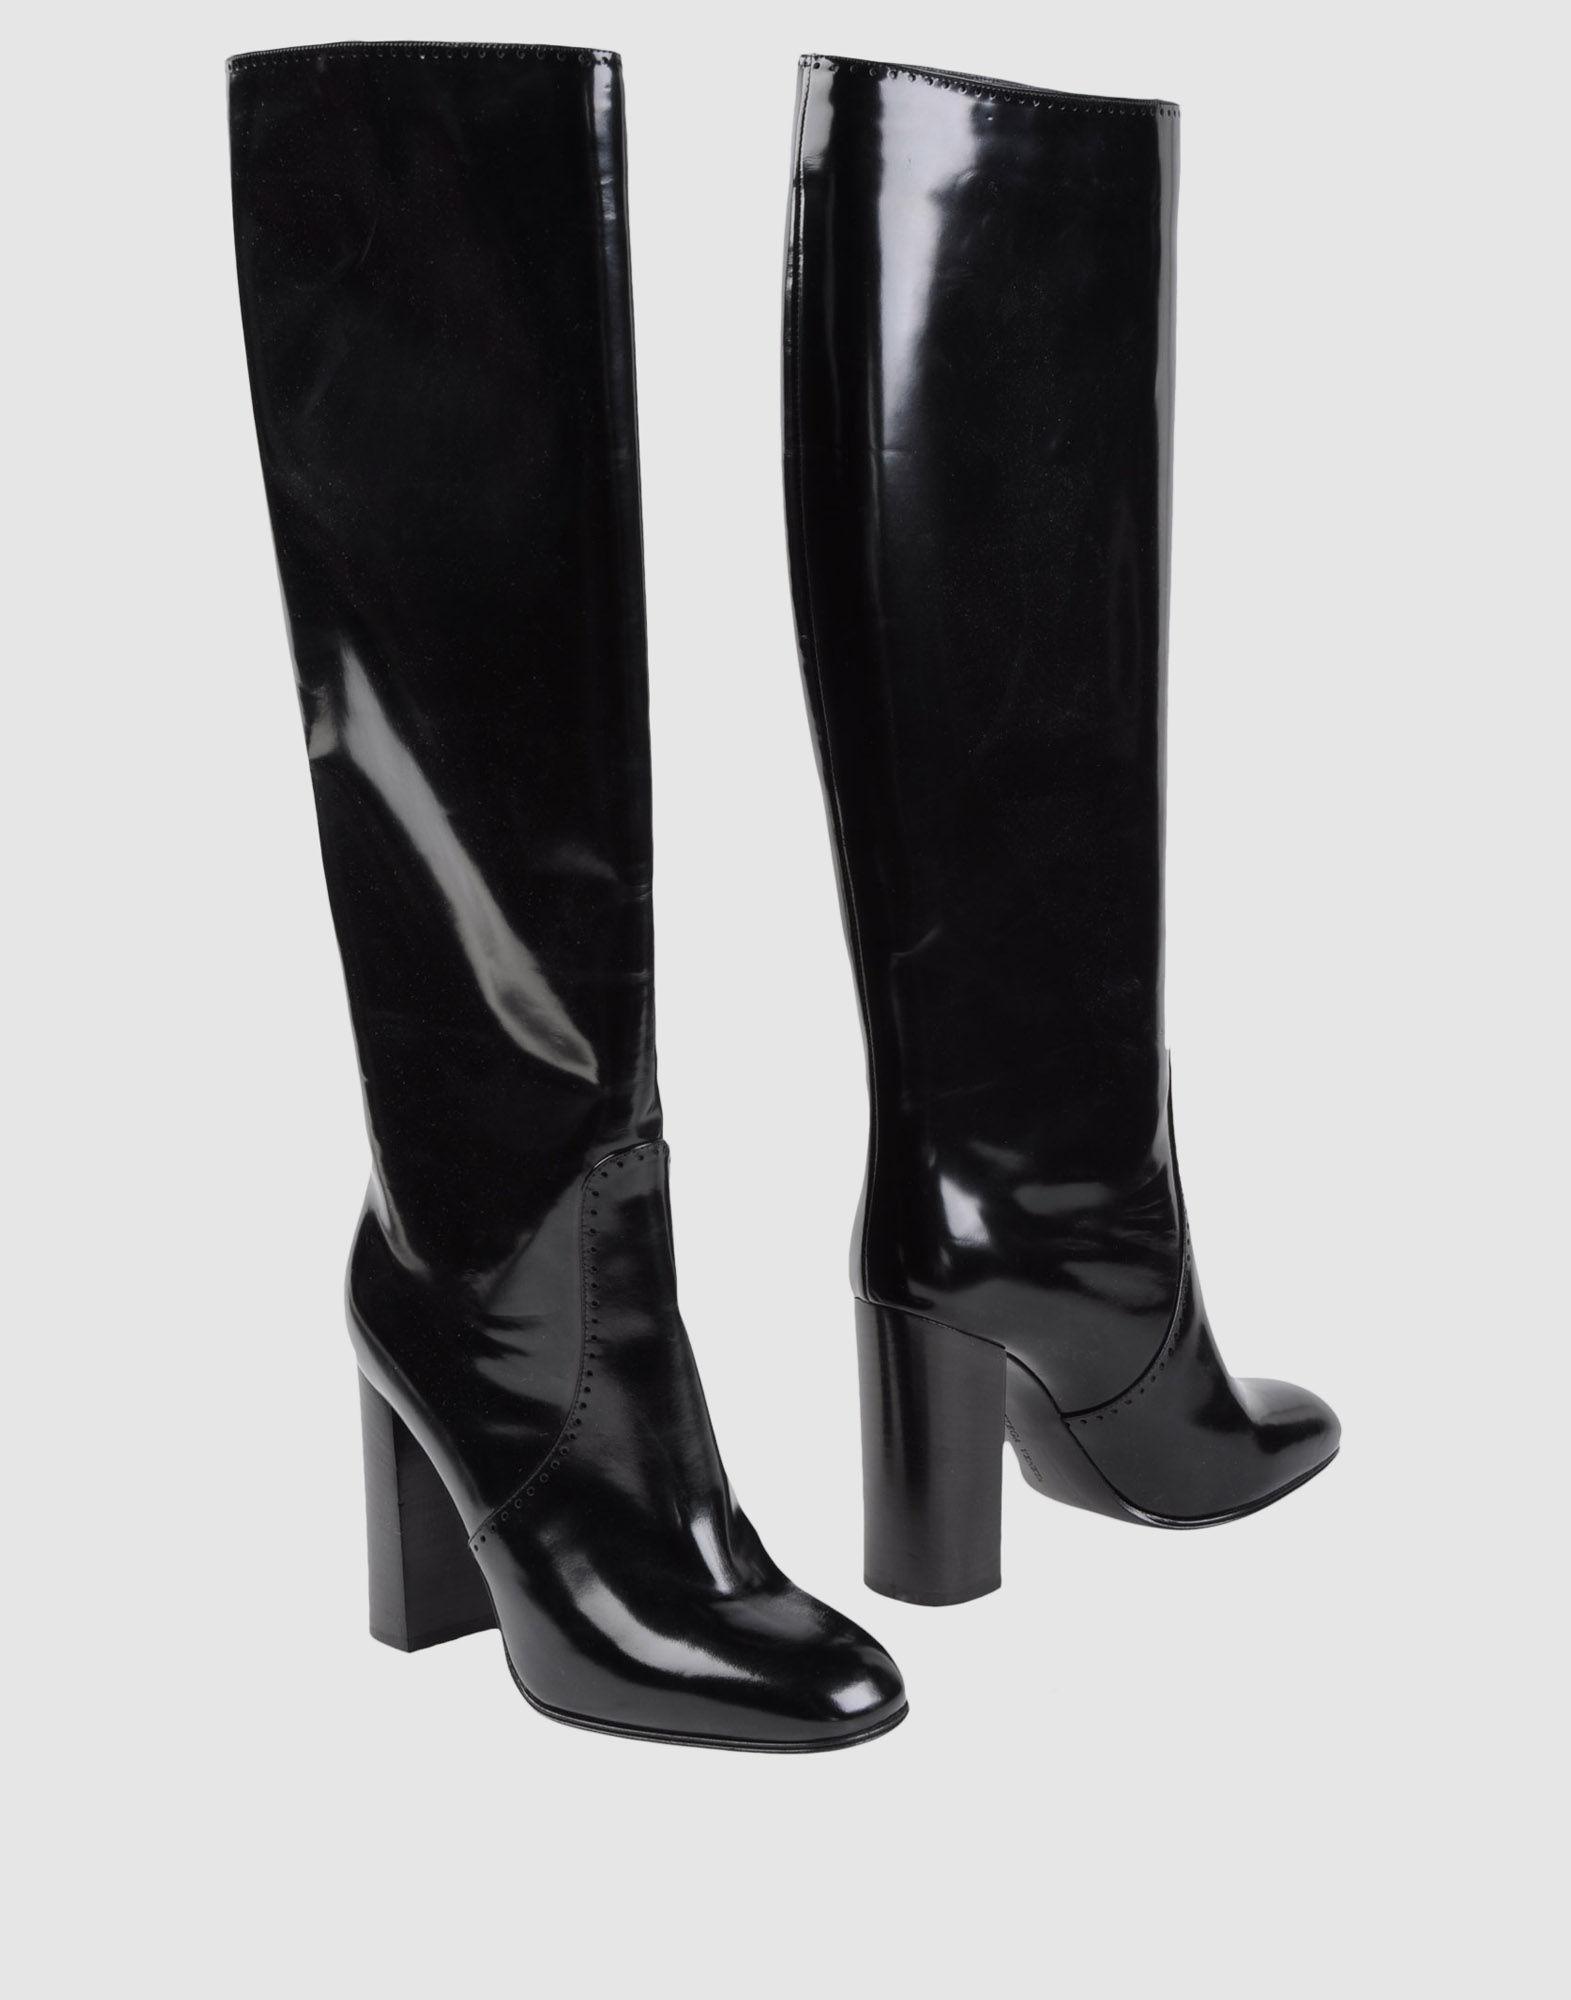 Bottega Veneta Patent Leather Knee-High Boots outlet professional Gr10k59X5K